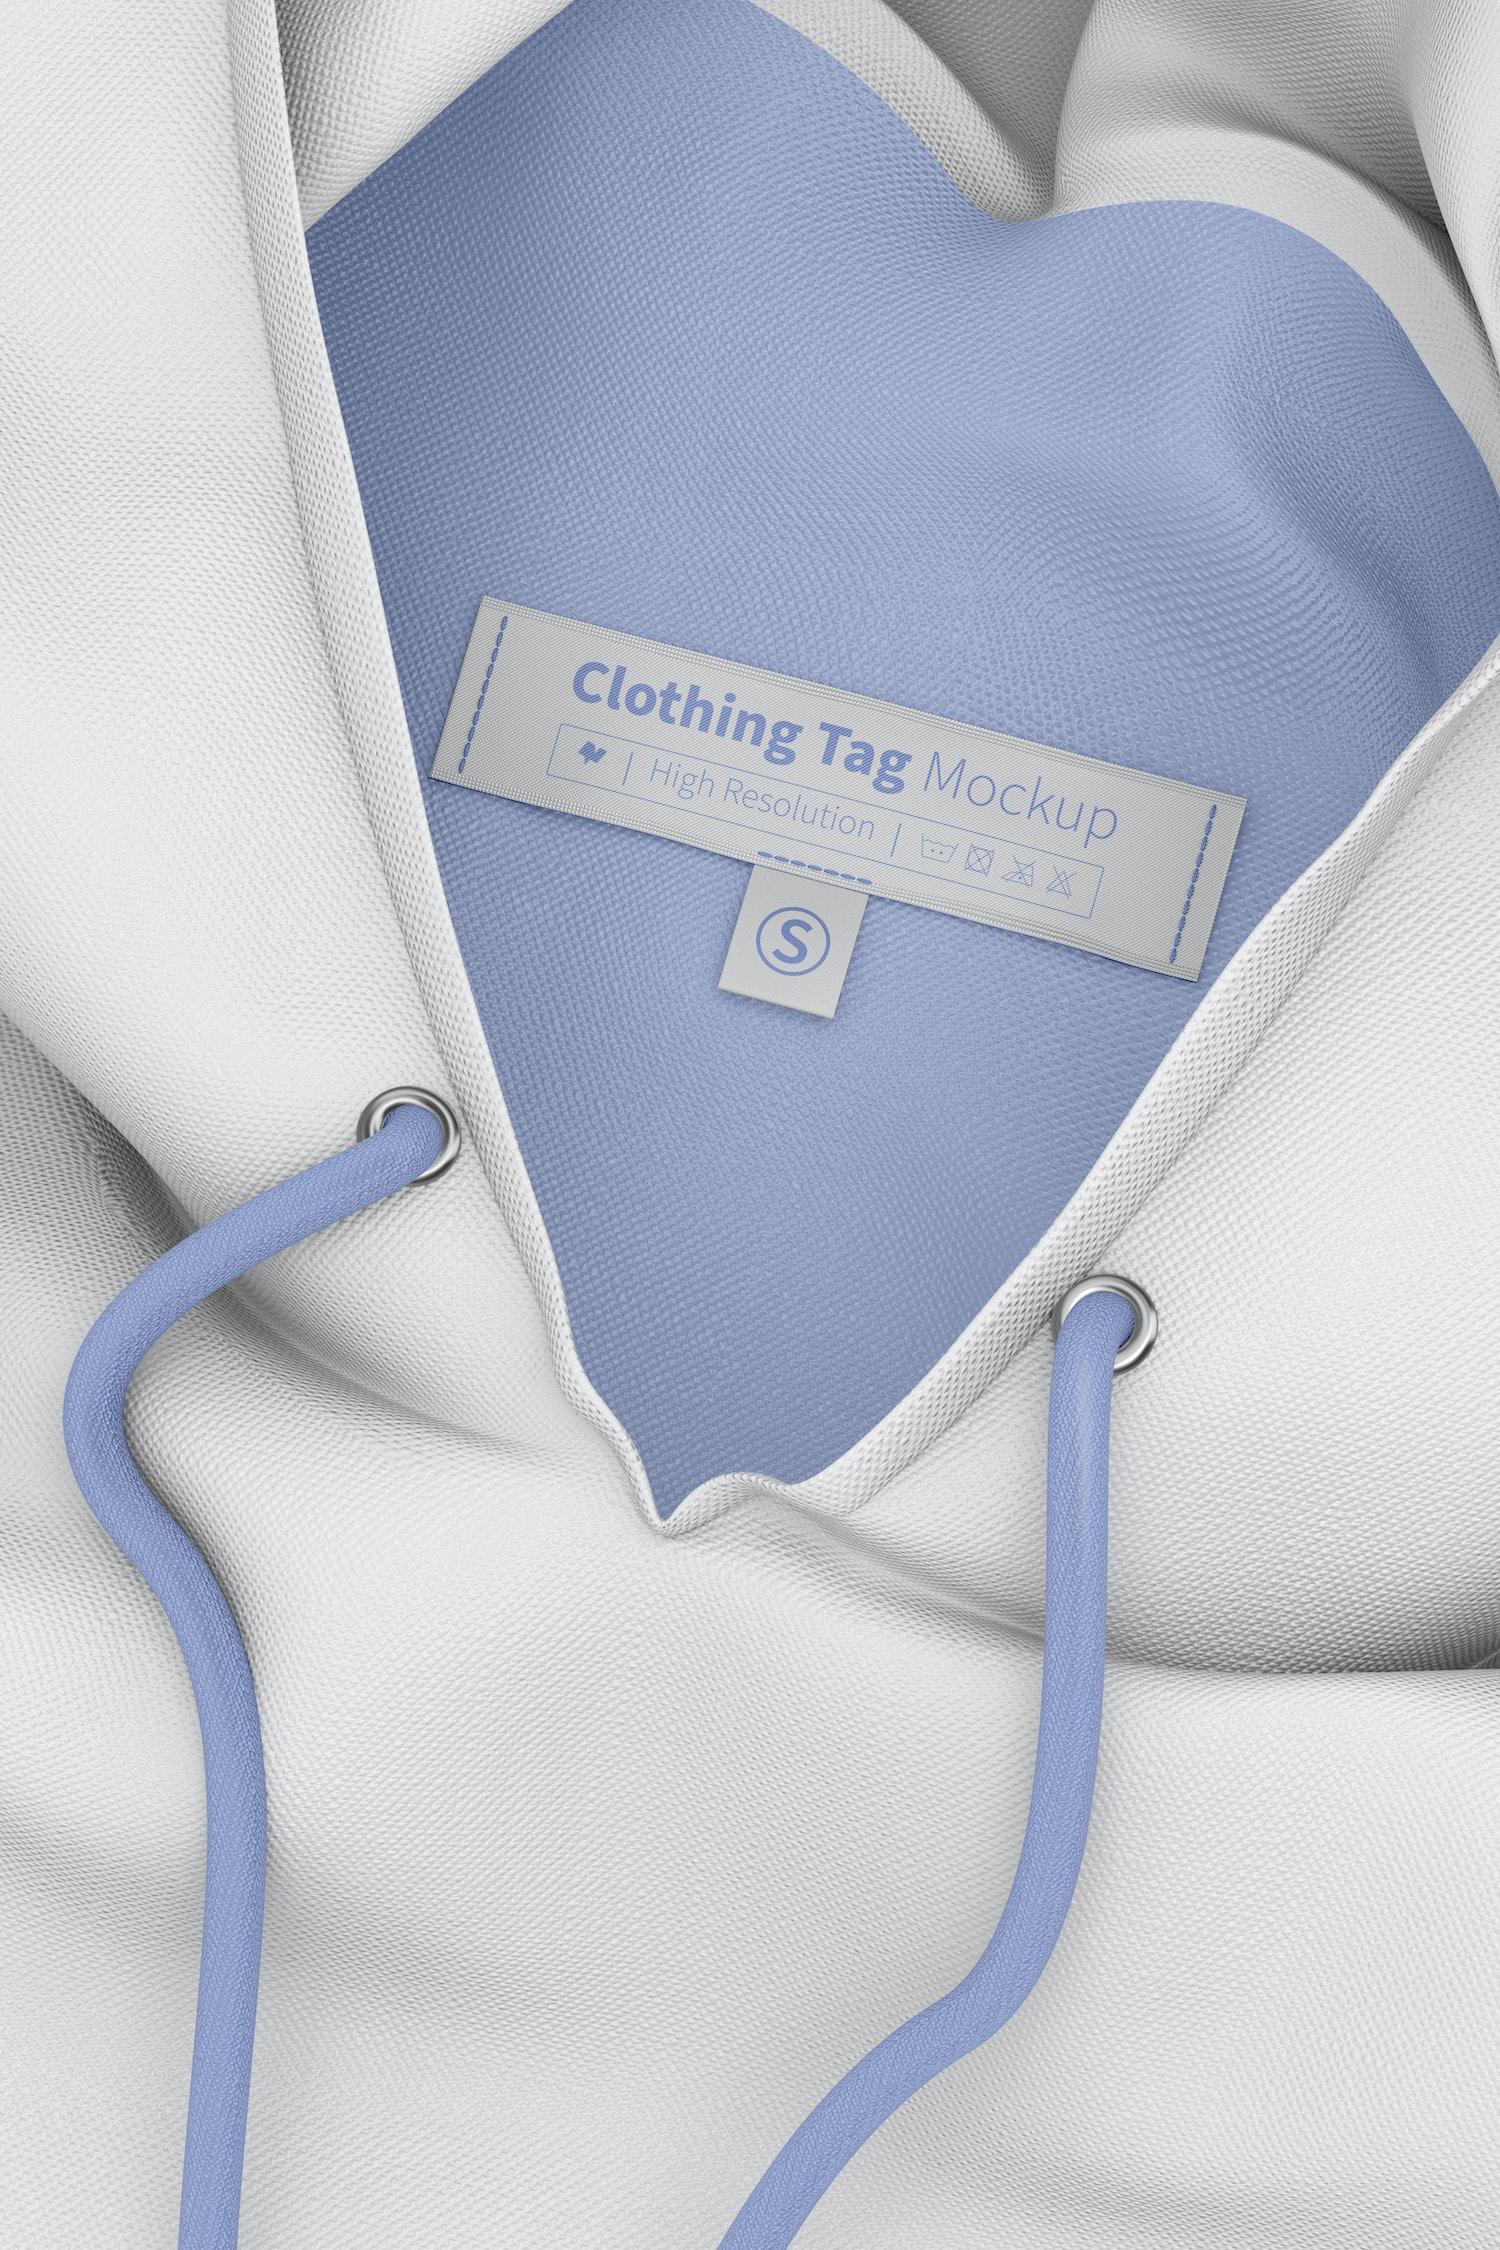 Clothing Tags Mockup, on Hoodie